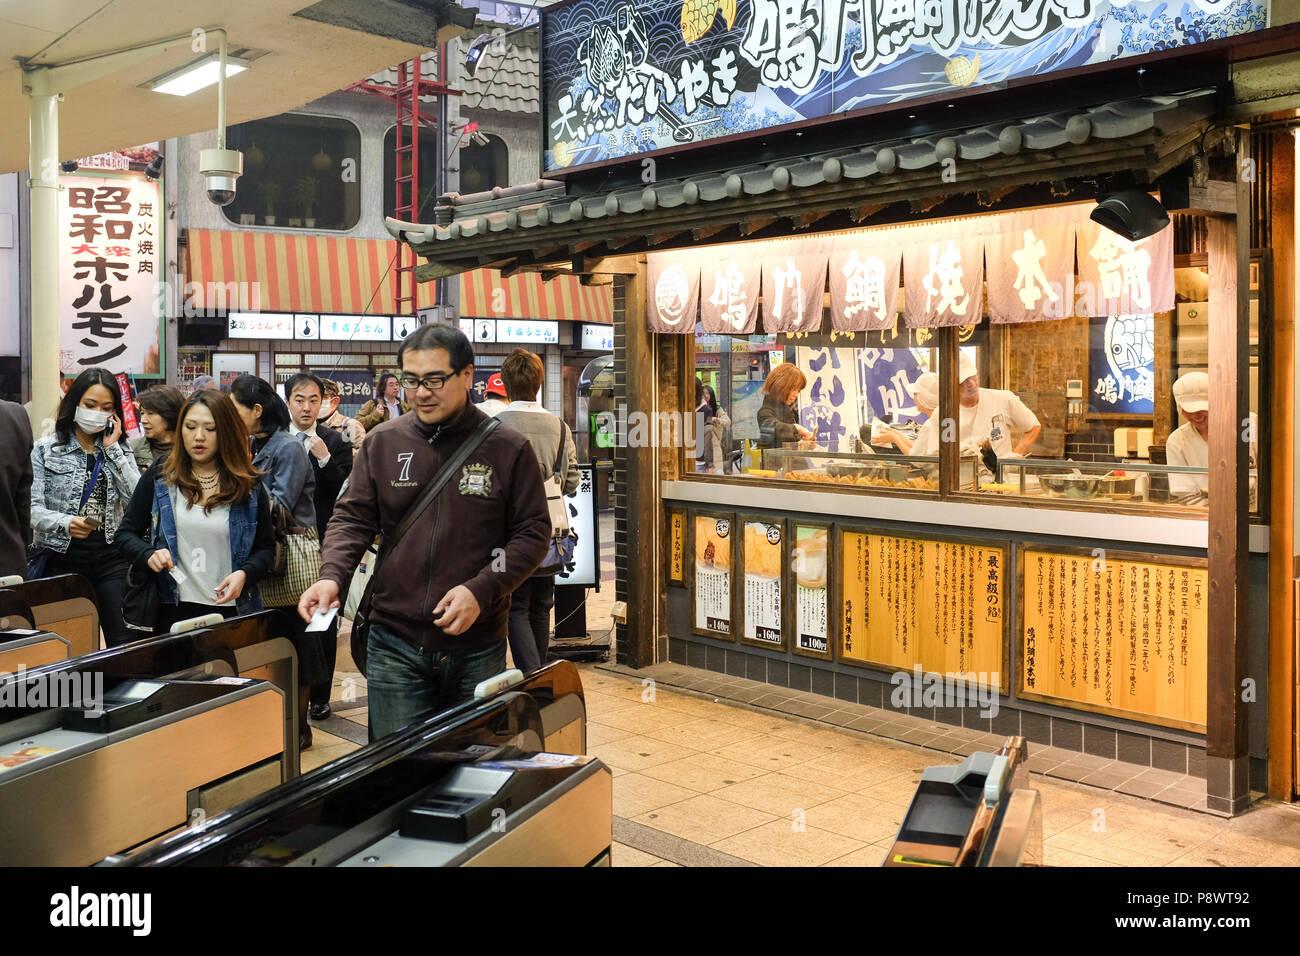 Japan Railway Station Food Stock Photos & Japan Railway Station Food